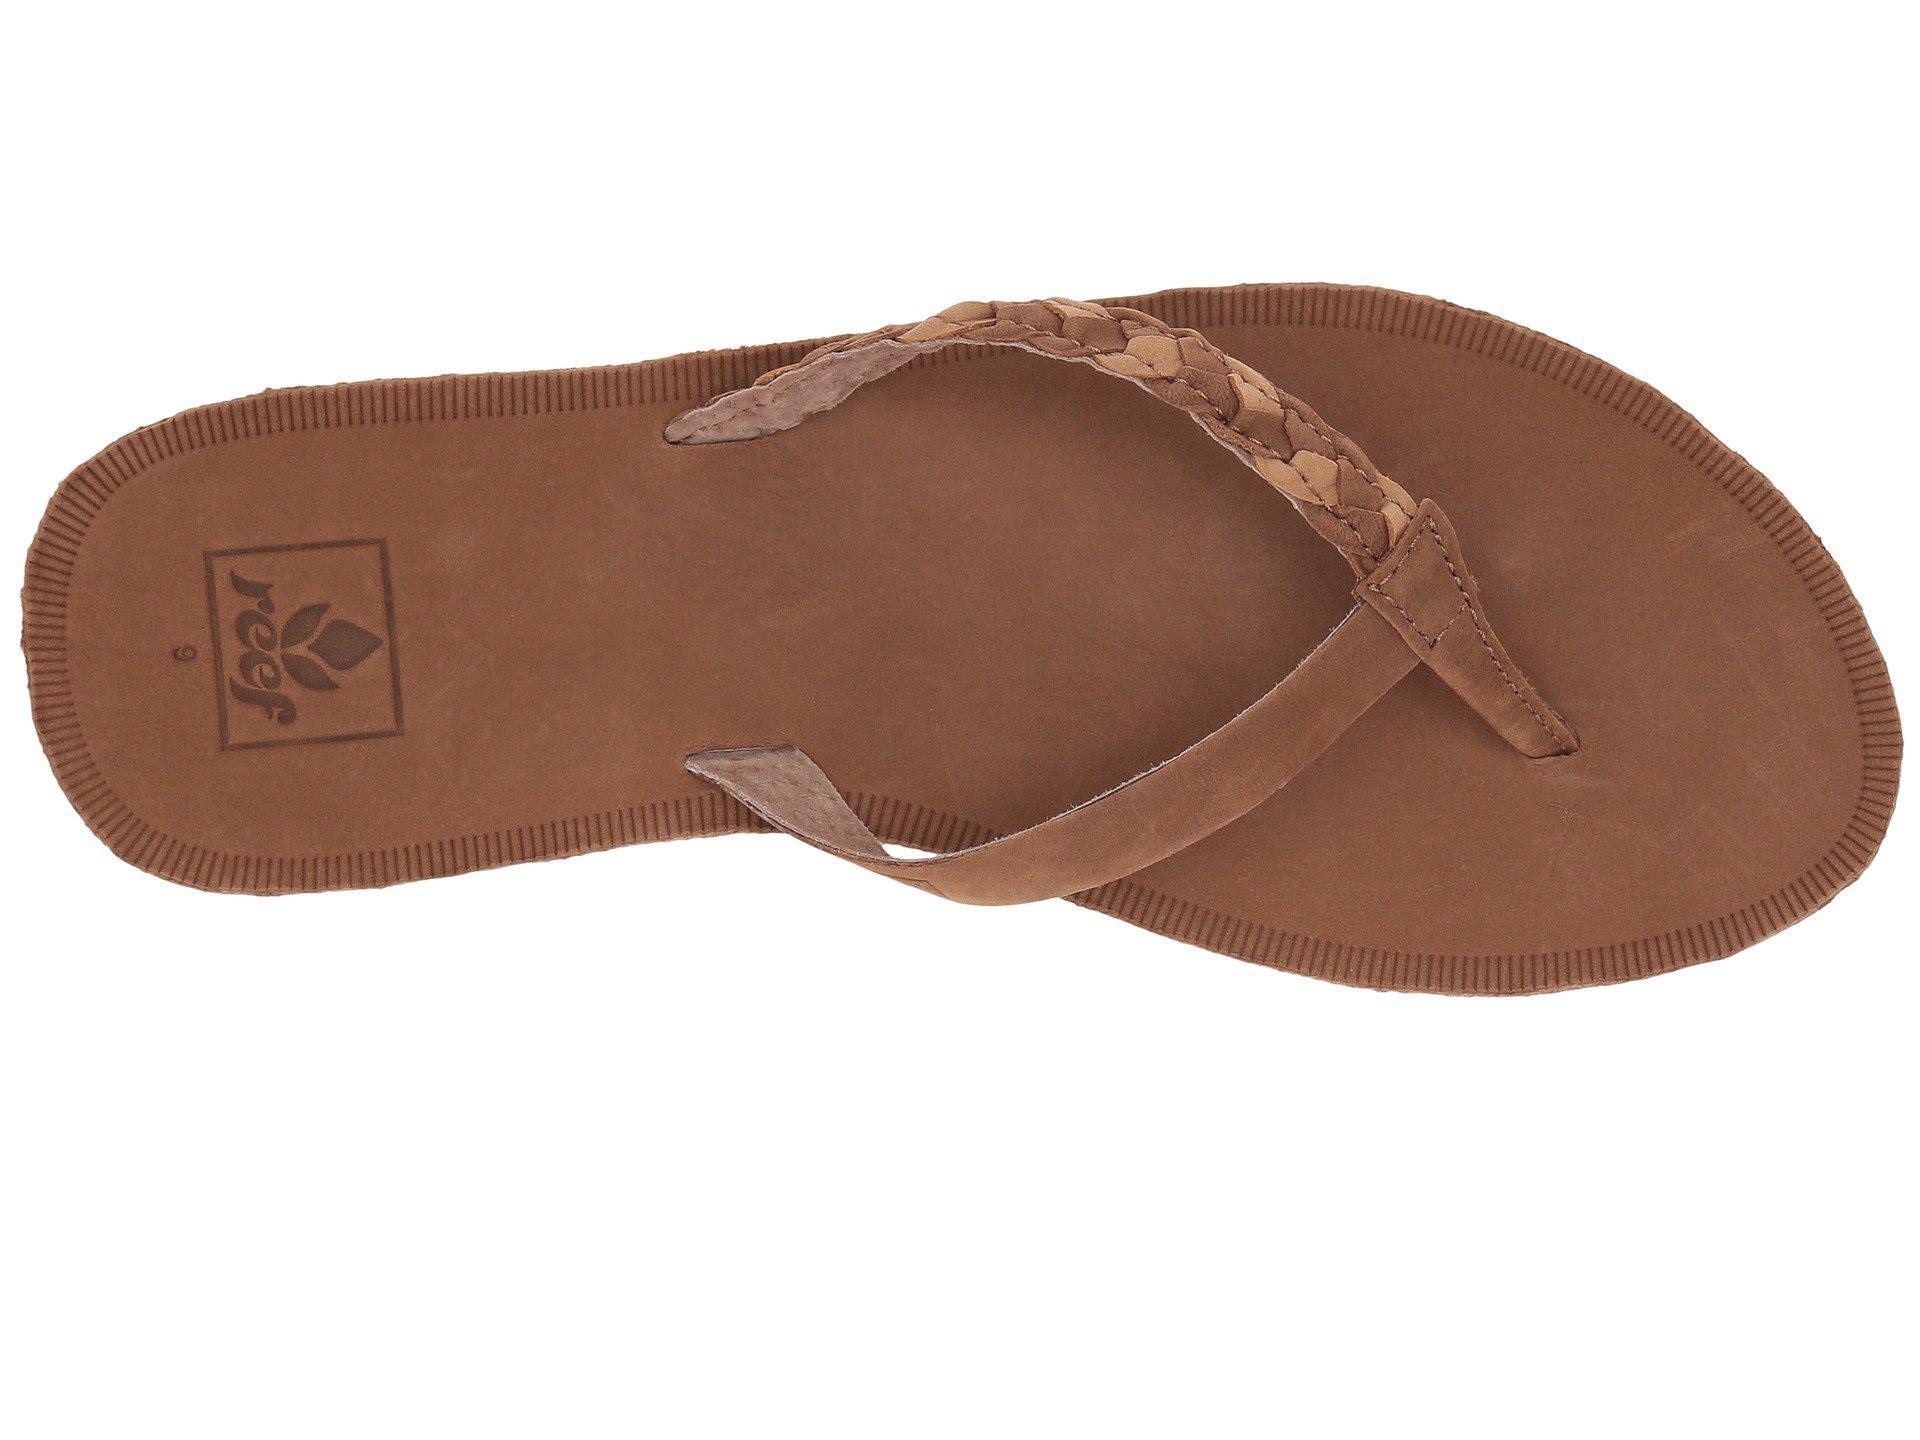 65df33c11 Reef - Brown Voyage Sunset (caramel) Women s Sandals - Lyst. View fullscreen